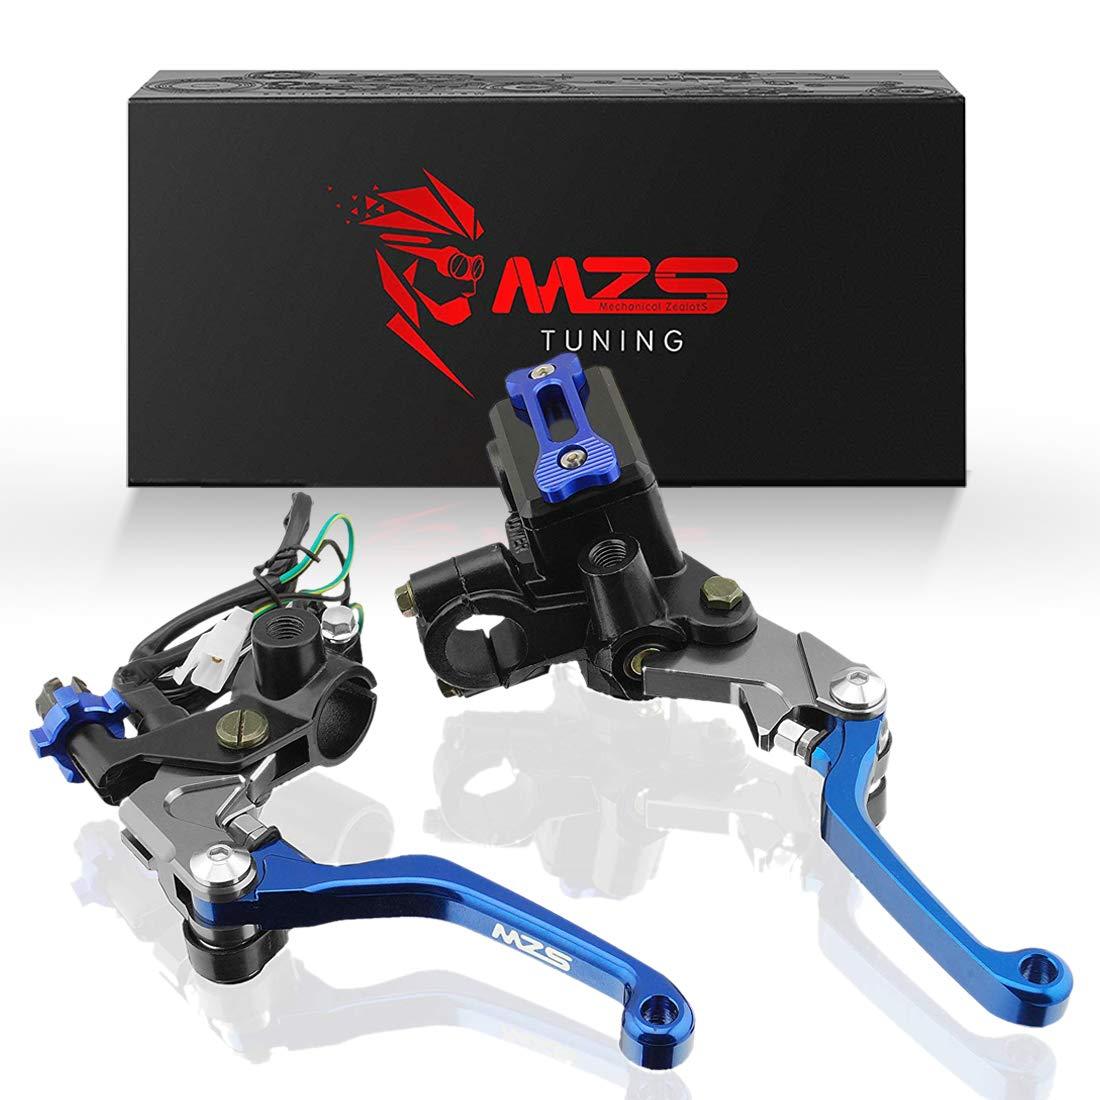 MZS 7/8'' Brake Master Cylinder Reservoir Pivot Levers for Honda Yamaha Suzuki Kawasaki KTM and more Blue by MZS